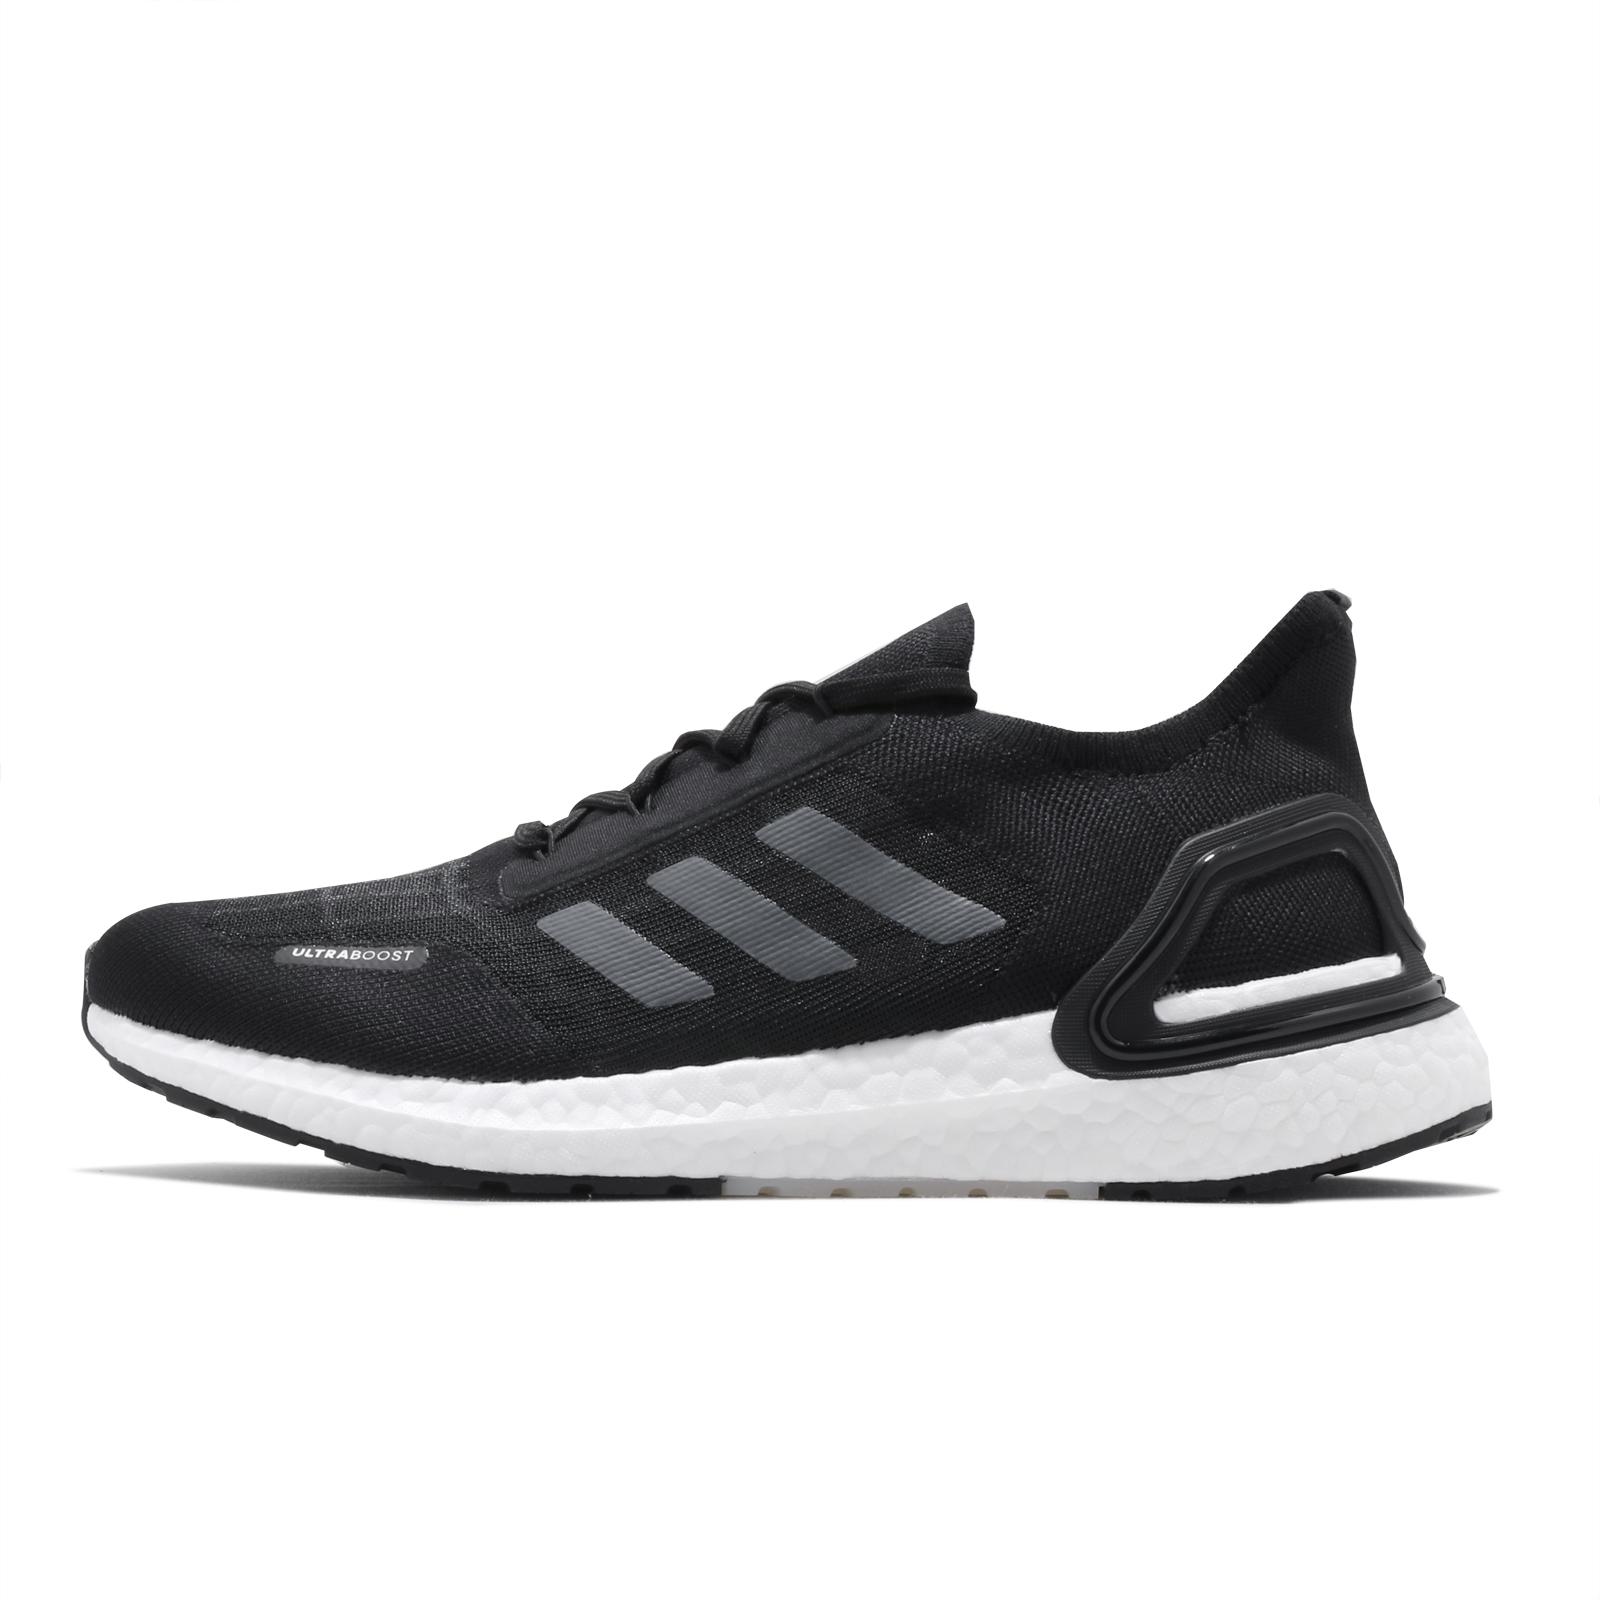 adidas 慢跑鞋 UltraBOOST Summer.RDY 黑灰 白 男鞋 愛迪達 運動鞋【ACS】 EG0748